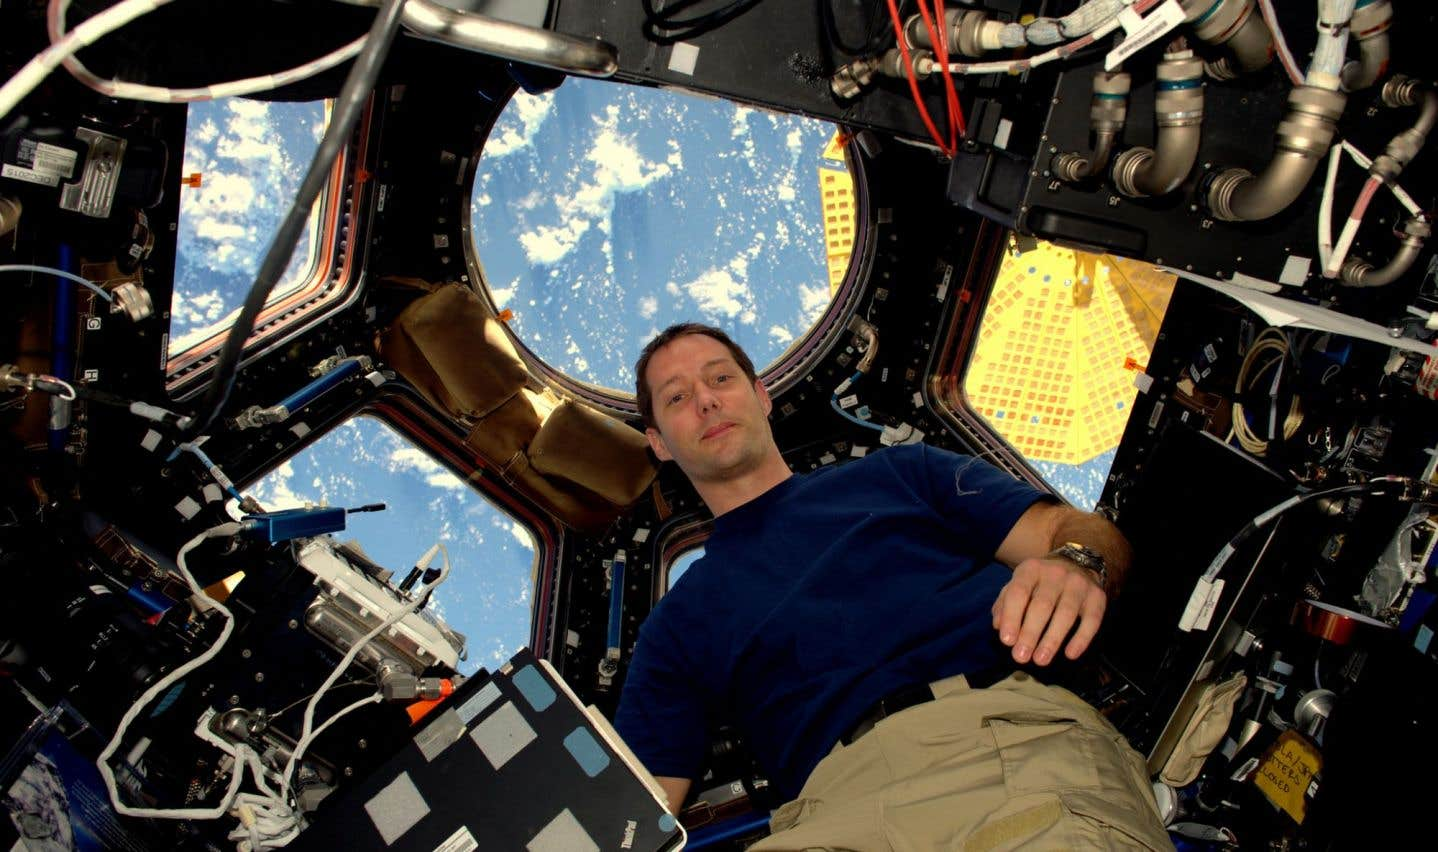 Les astronautes Thomas Pesquet et Oleg Novitski redescendent sur Terre